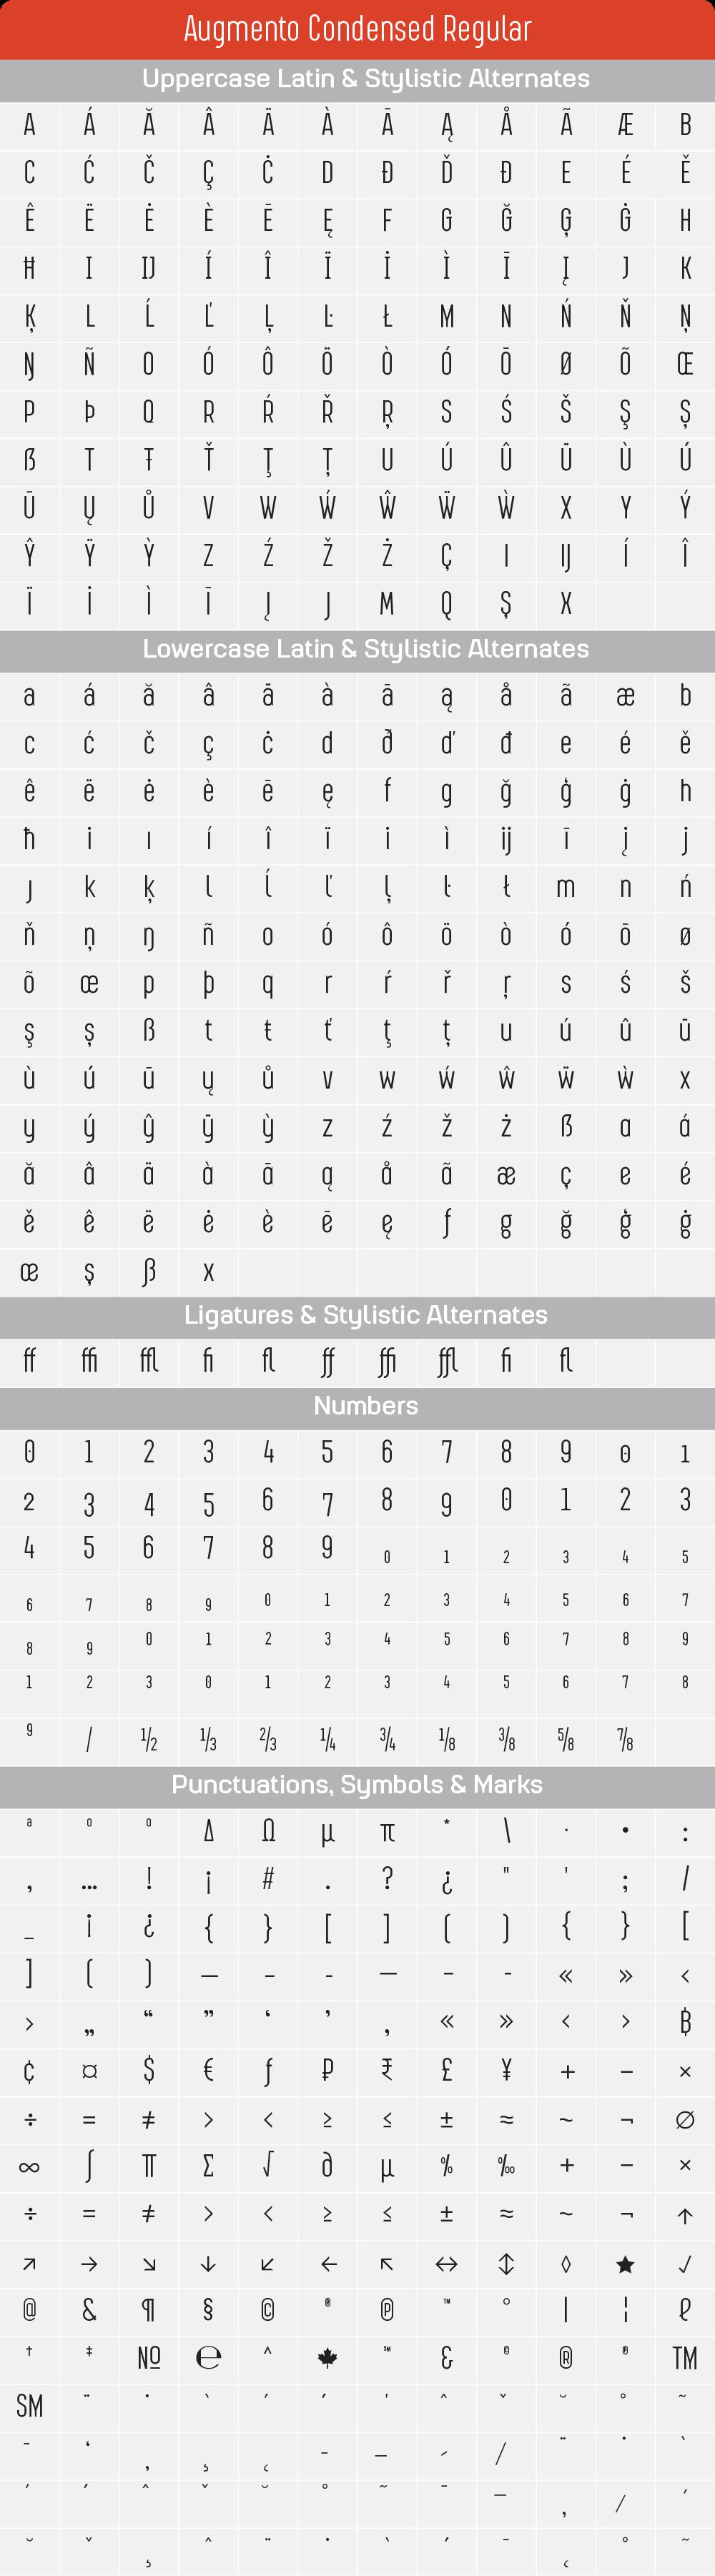 Condensed RegularAugmento-GlyphTable.png